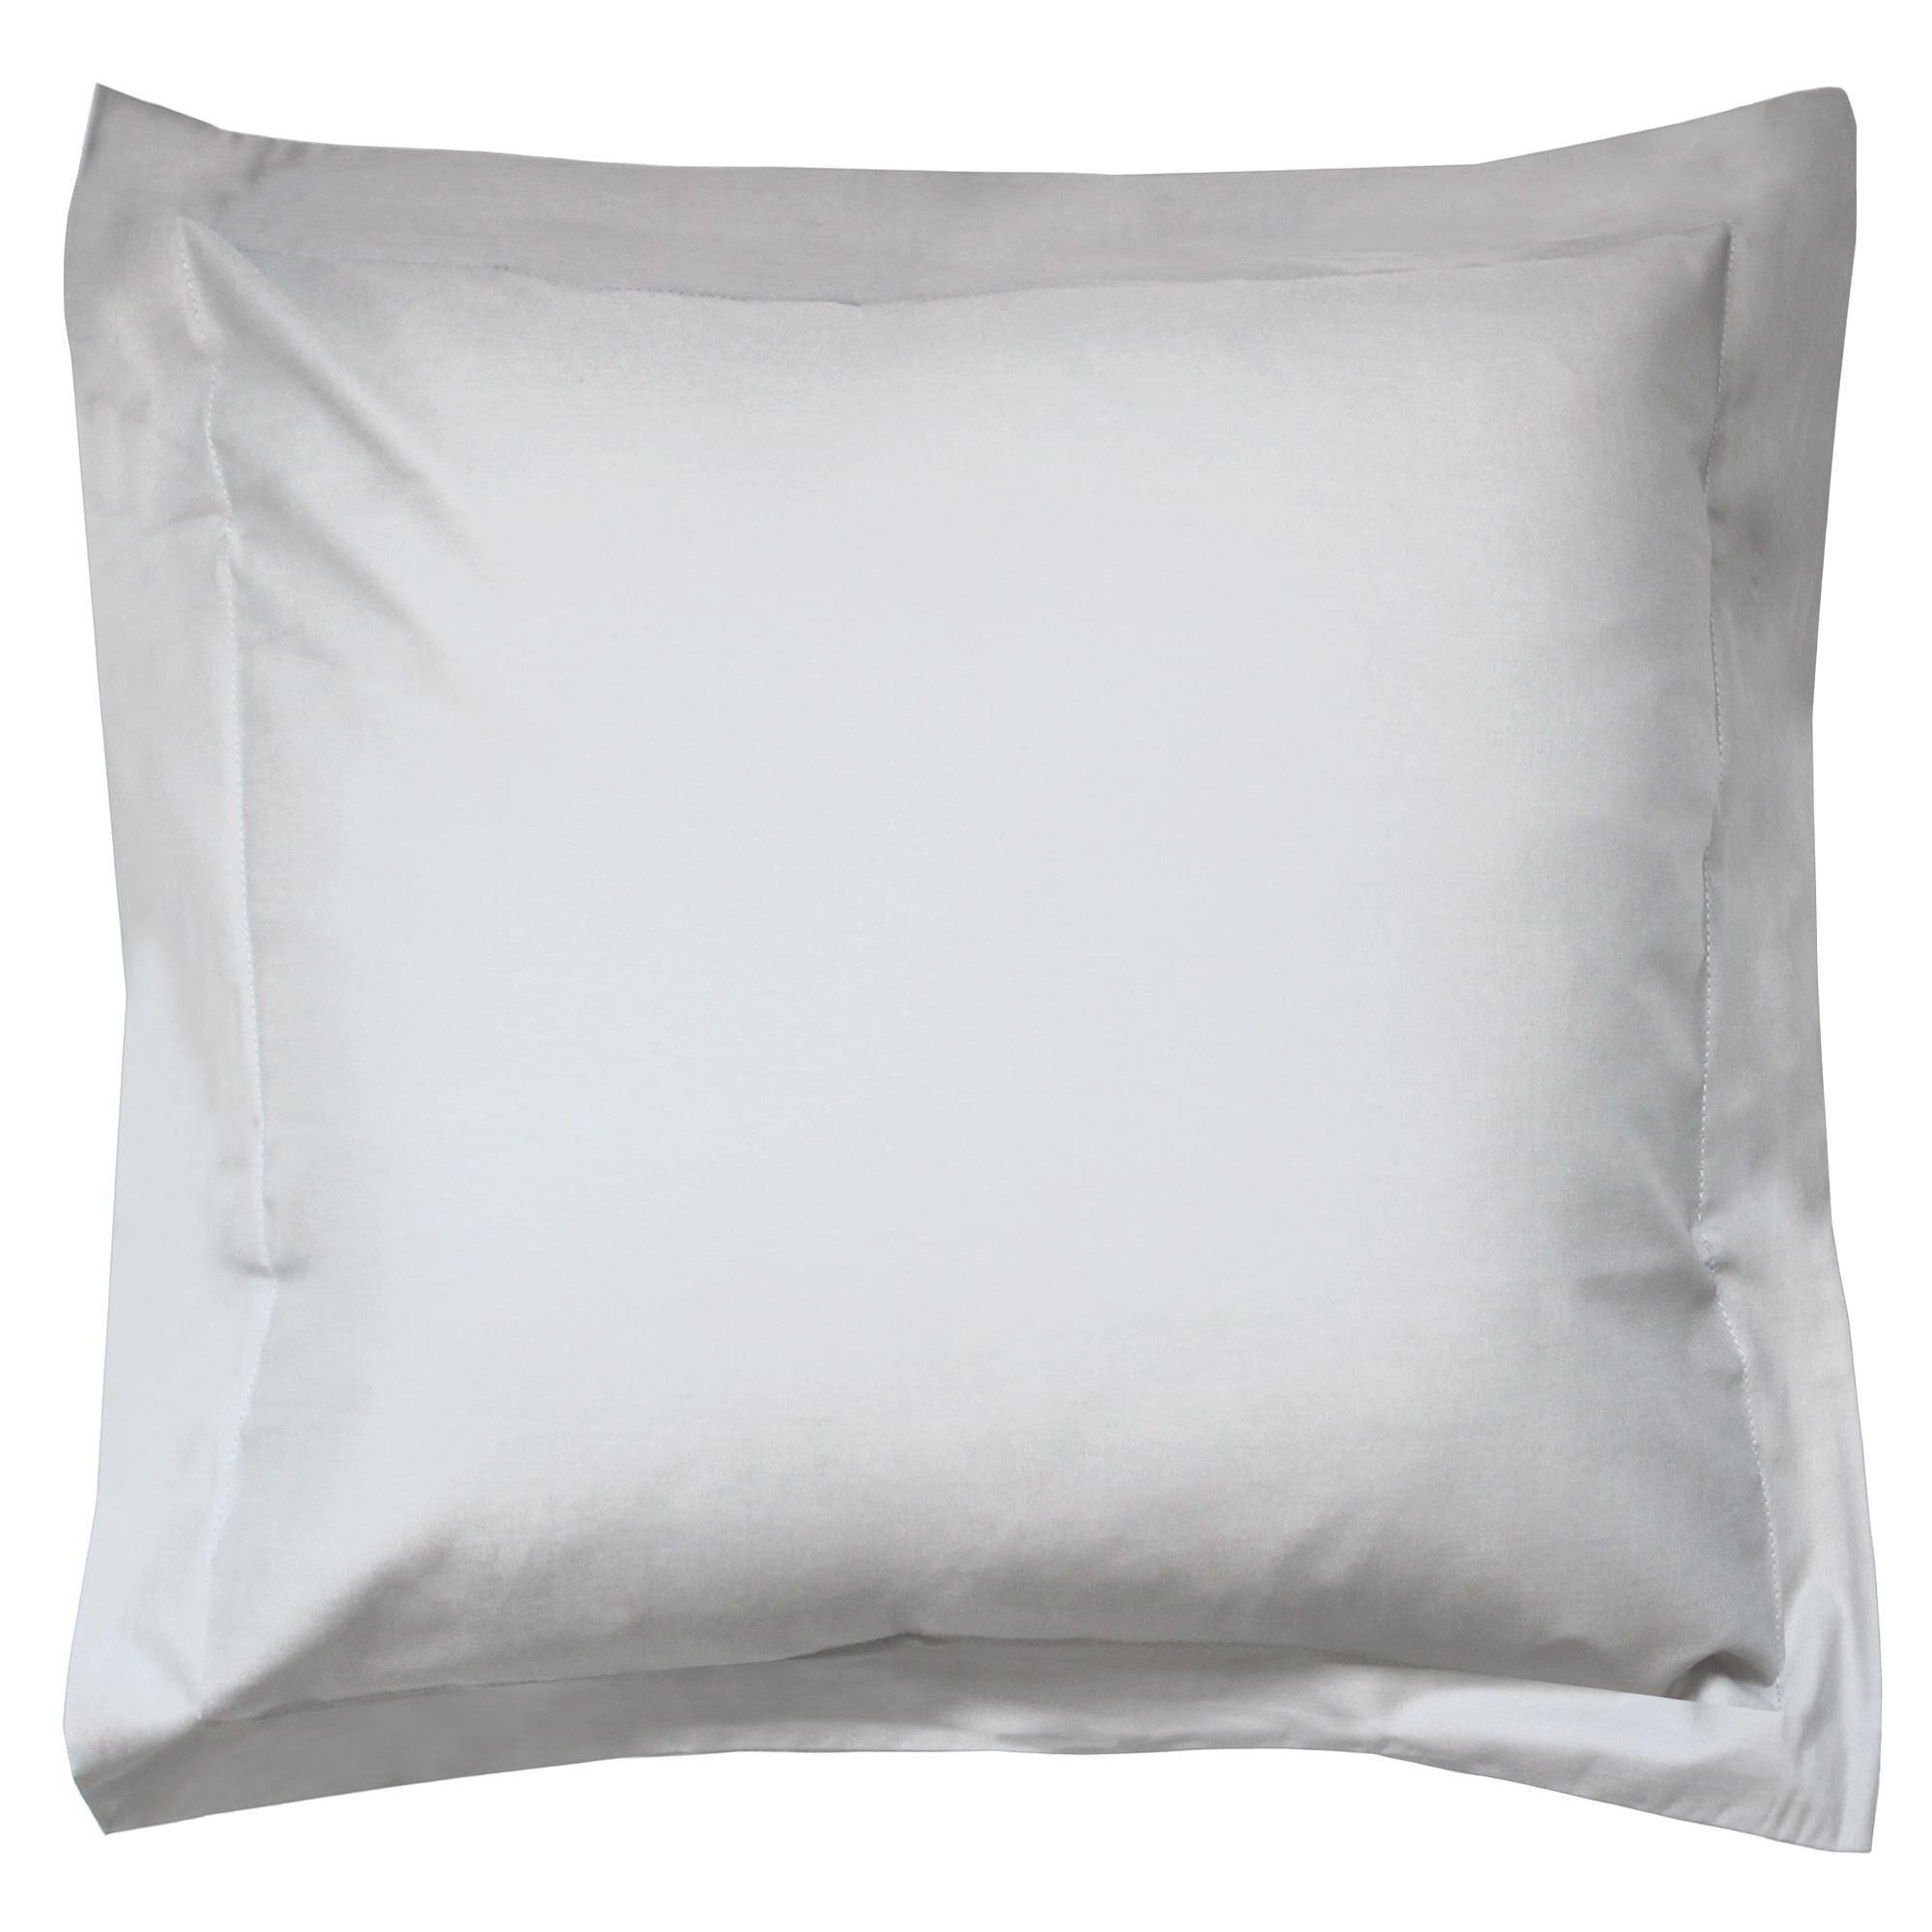 Linnea Taie d'oreiller uni 80x80 cm 100% coton ALTO Calcium